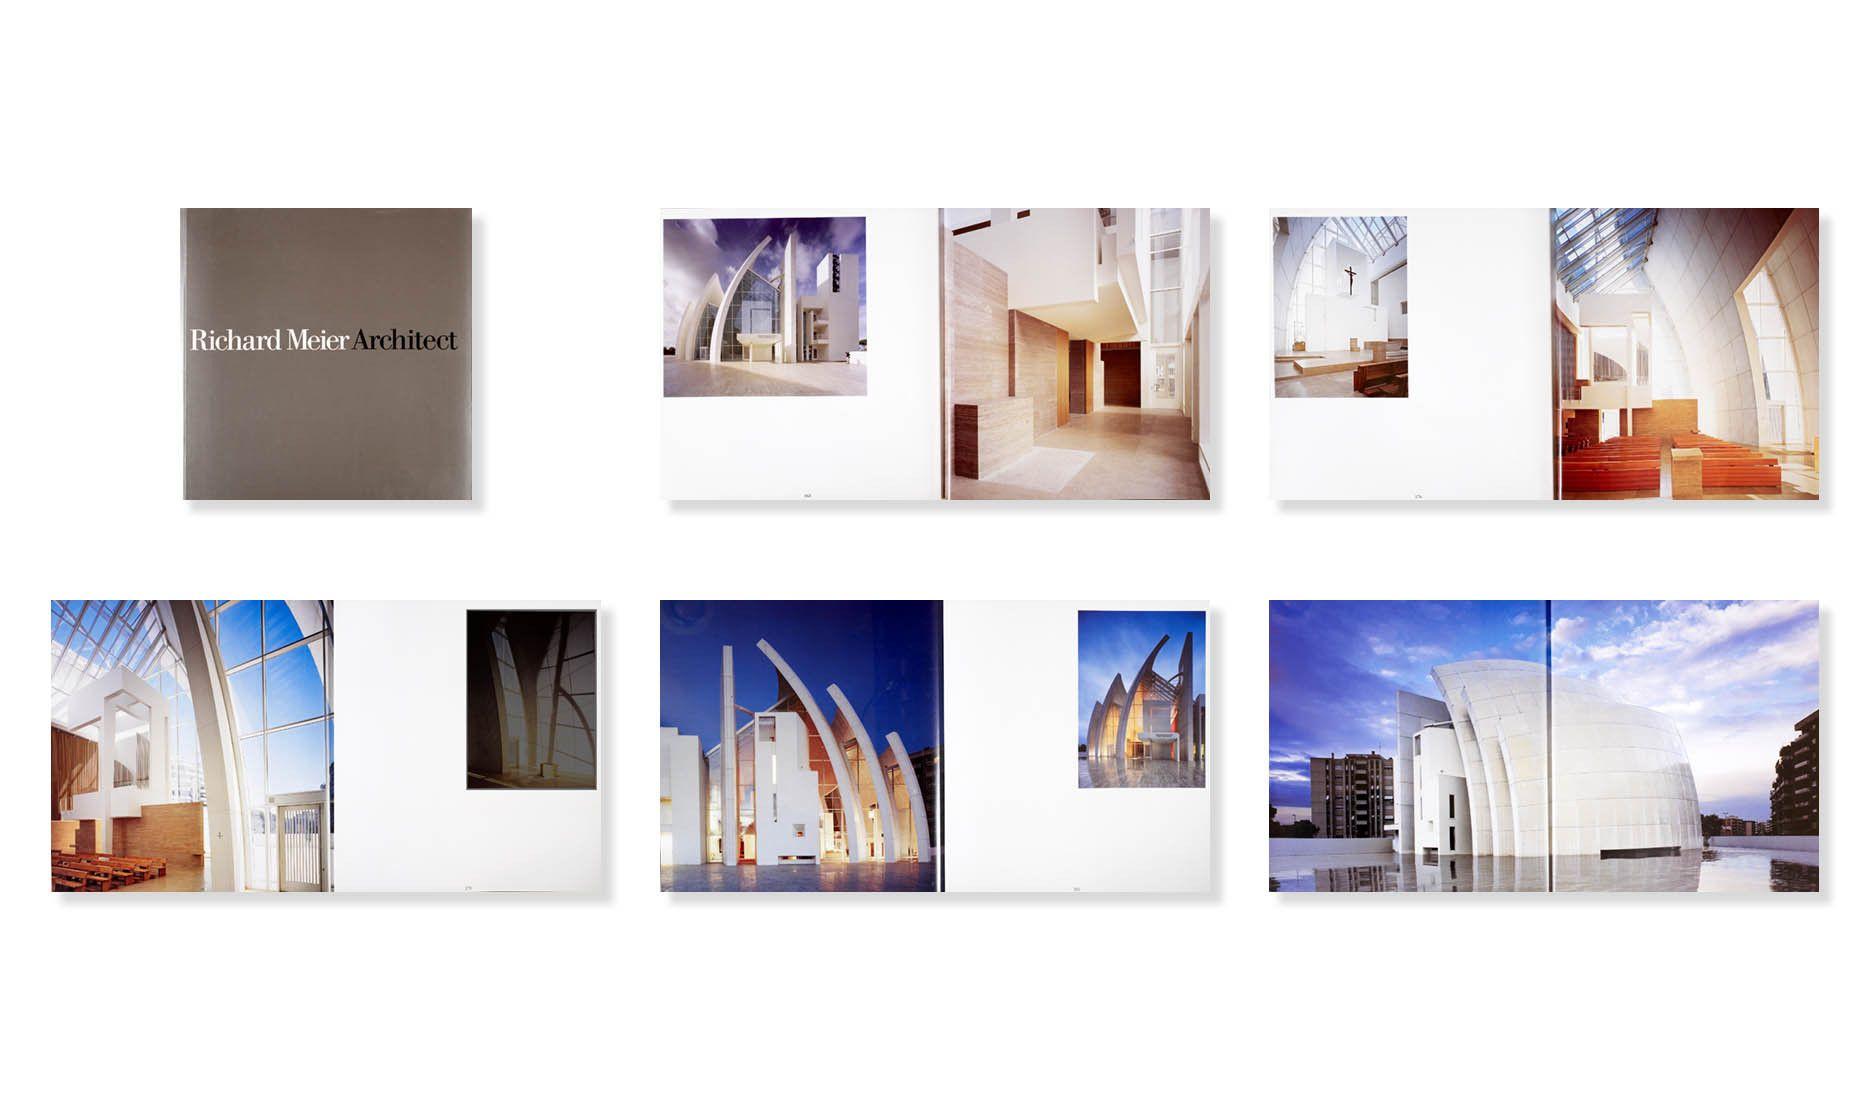 RICHARD MEIER ARCHITECT 2000-2004 . RIZZOLI . CONTRIBUTING PHOTOGRAPHER